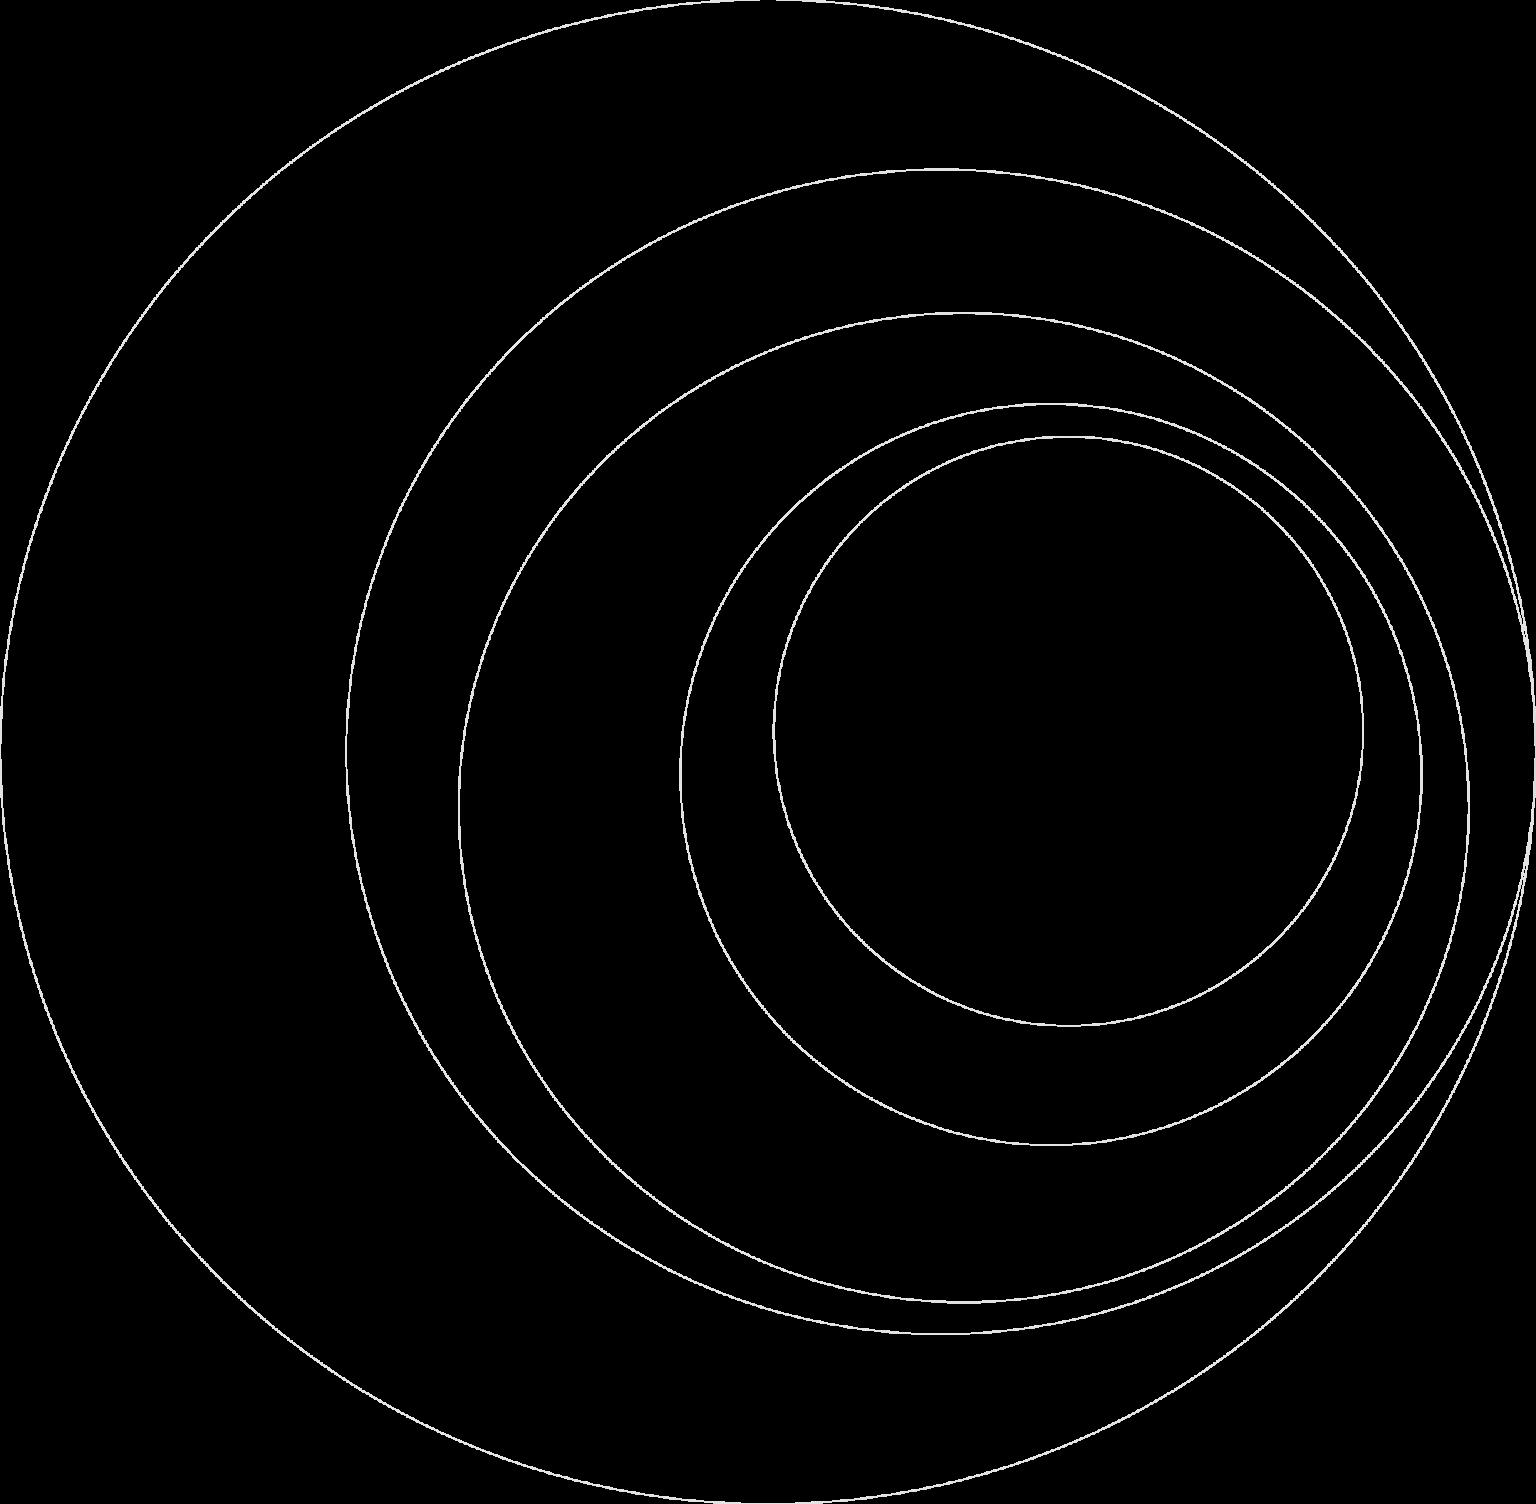 Big-Circles.png  Hope UI – Clean Design System & Dashboard Big Circles pbsb0ihx1gl99ypcjo8y4naootnwzzxsple8xqfs8w